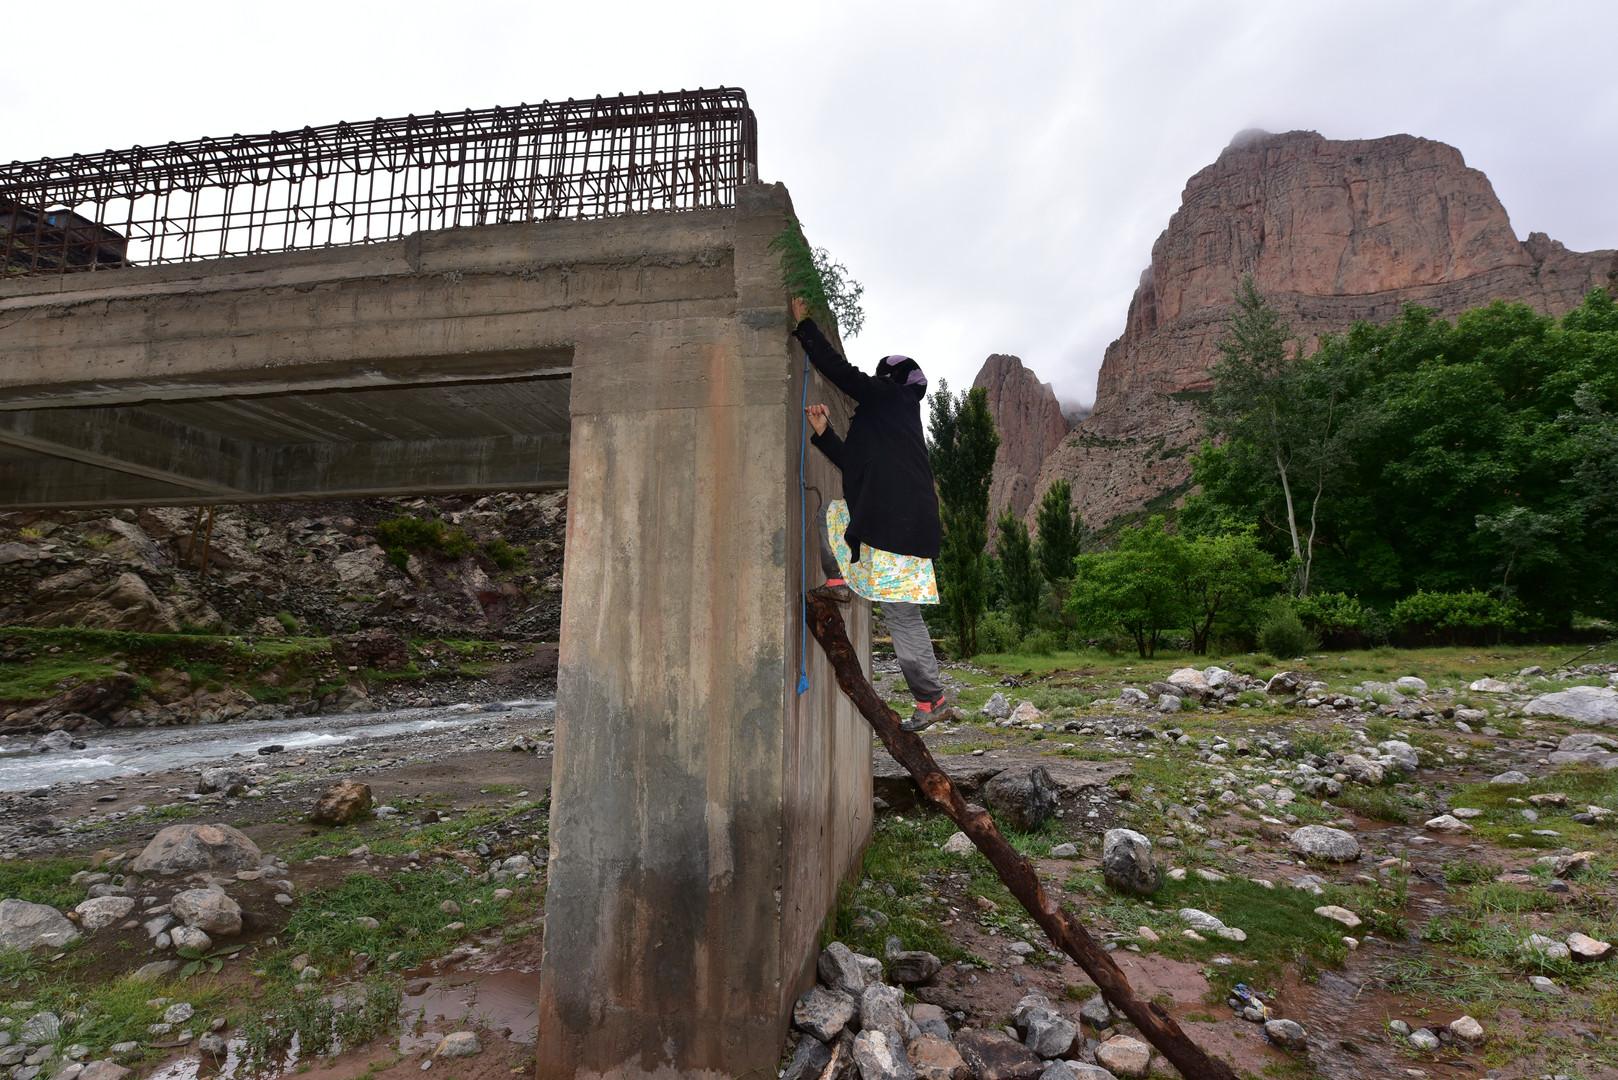 Die Brücke in Taghia